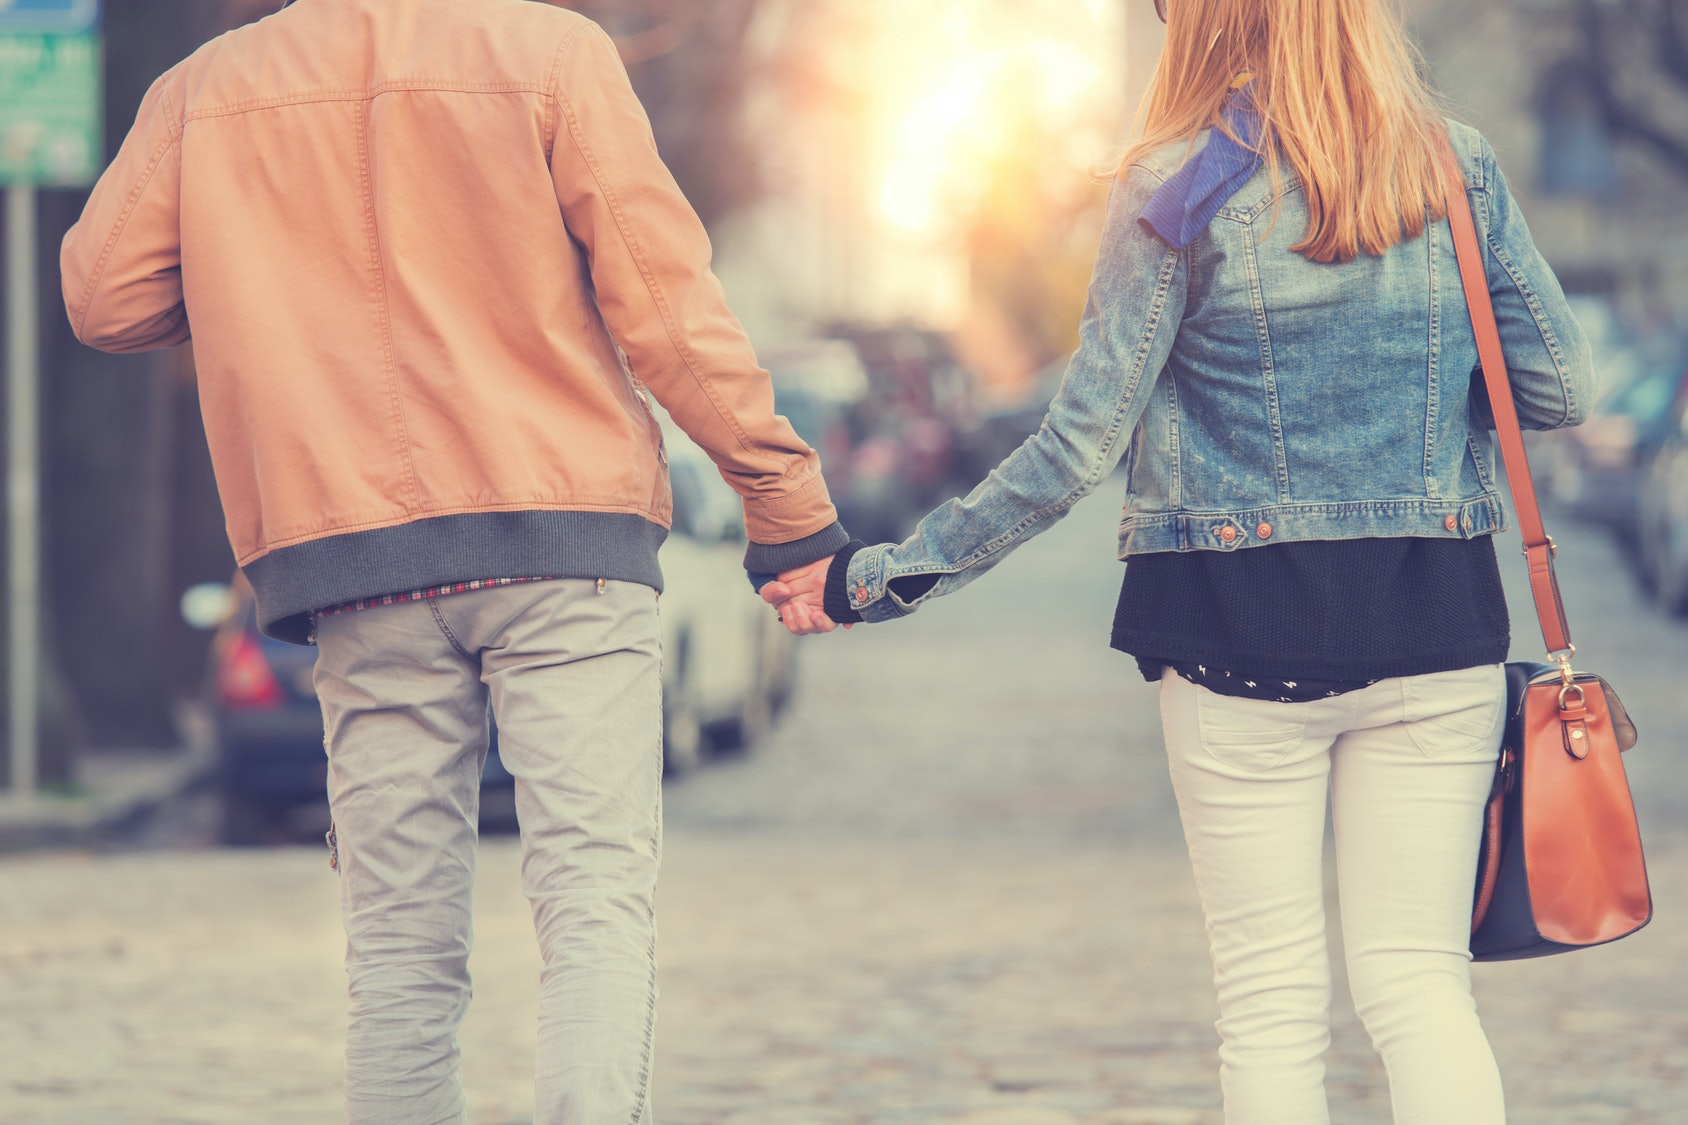 Casual Dating Urban woordenboek Dating Sarah beeny